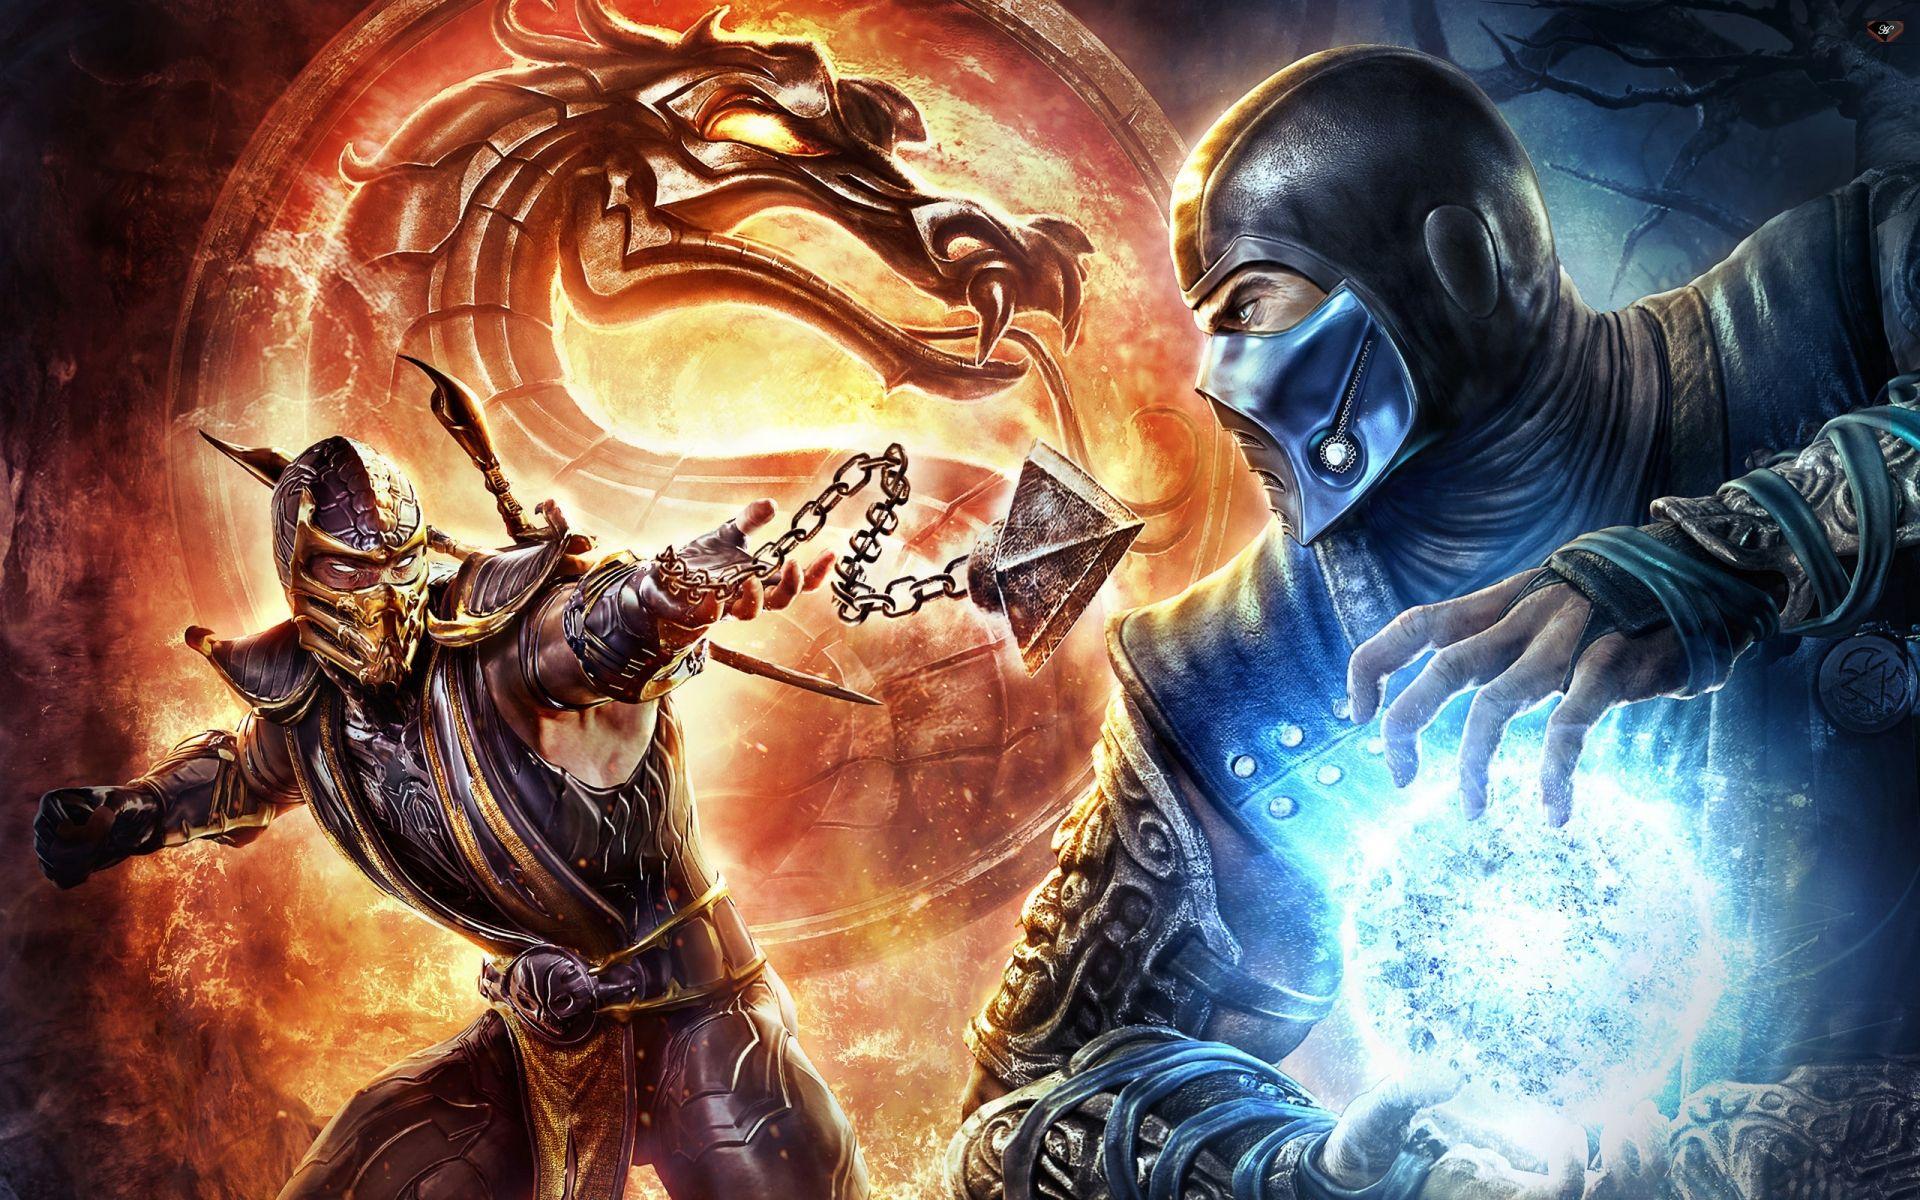 Google v theme song - Mortal Kombat X Cool Images Google Search